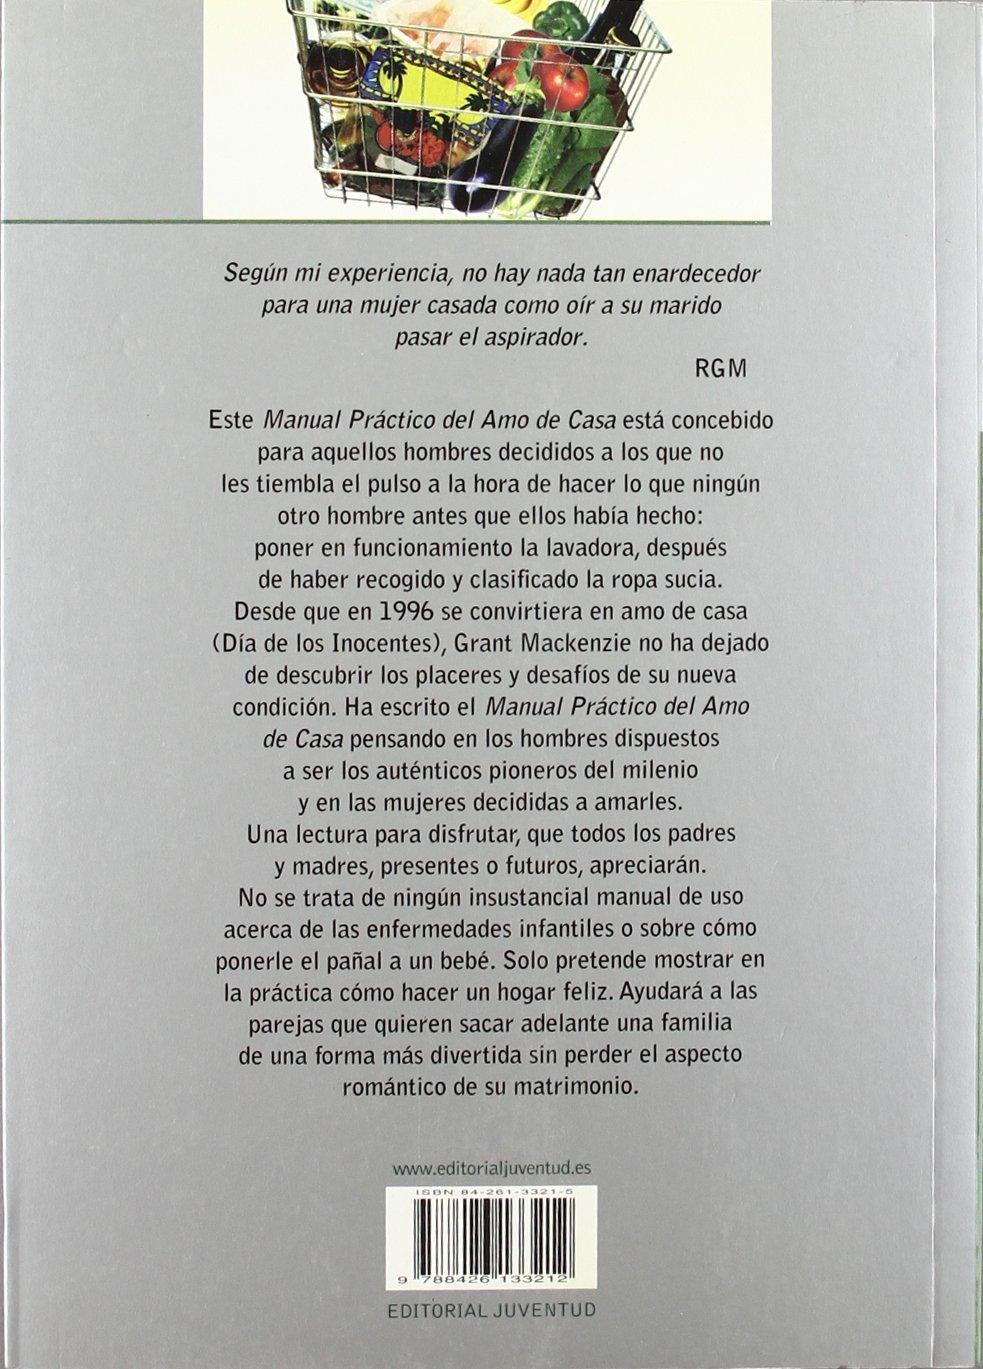 Manual práctico del amo de casa: GRANT MACKENZIE: 9788426133212: Amazon.com: Books